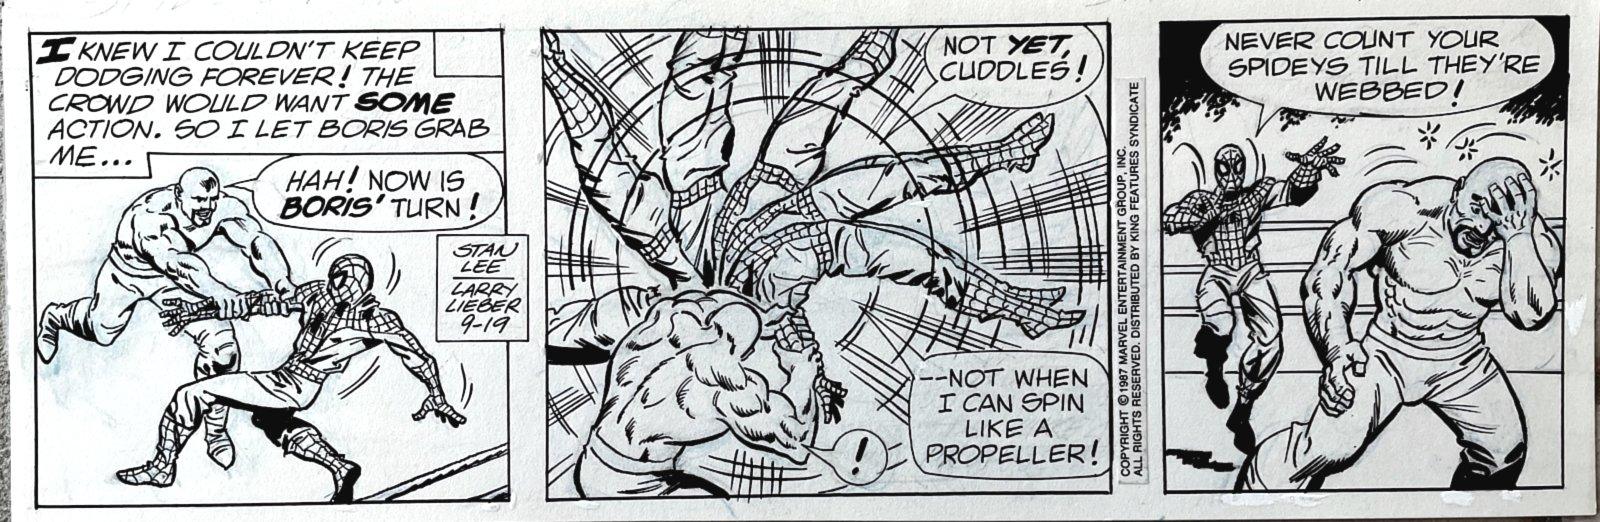 Strip (SPIDEY'S FIRST BATTLE AS HIS ORIGIN IS RETOLD!) 9-19-1987